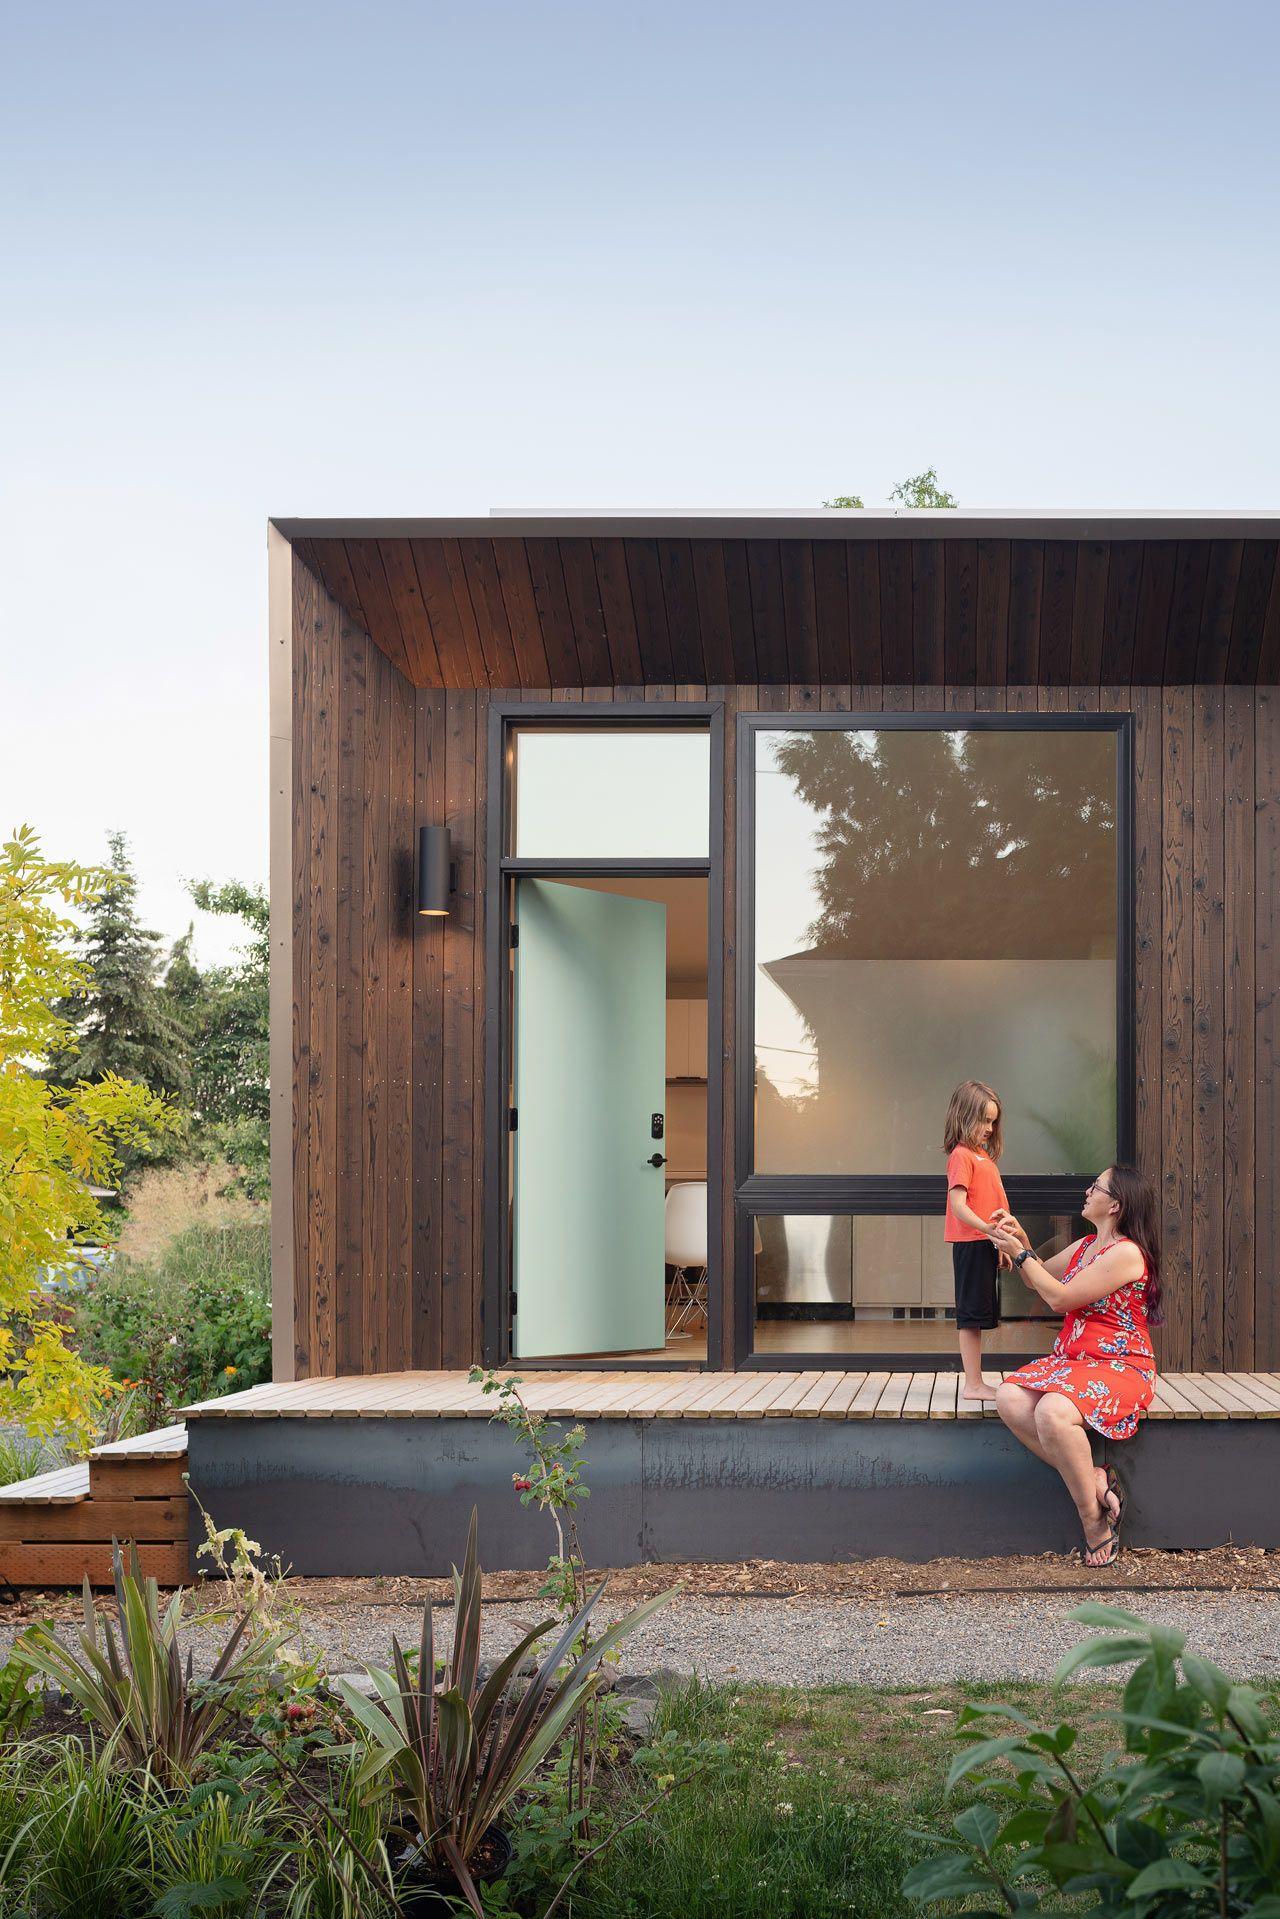 This One Bedroom Backyard Prefab In West Seattle Runs On Solar Power Backyard Cottage House Design Prefab